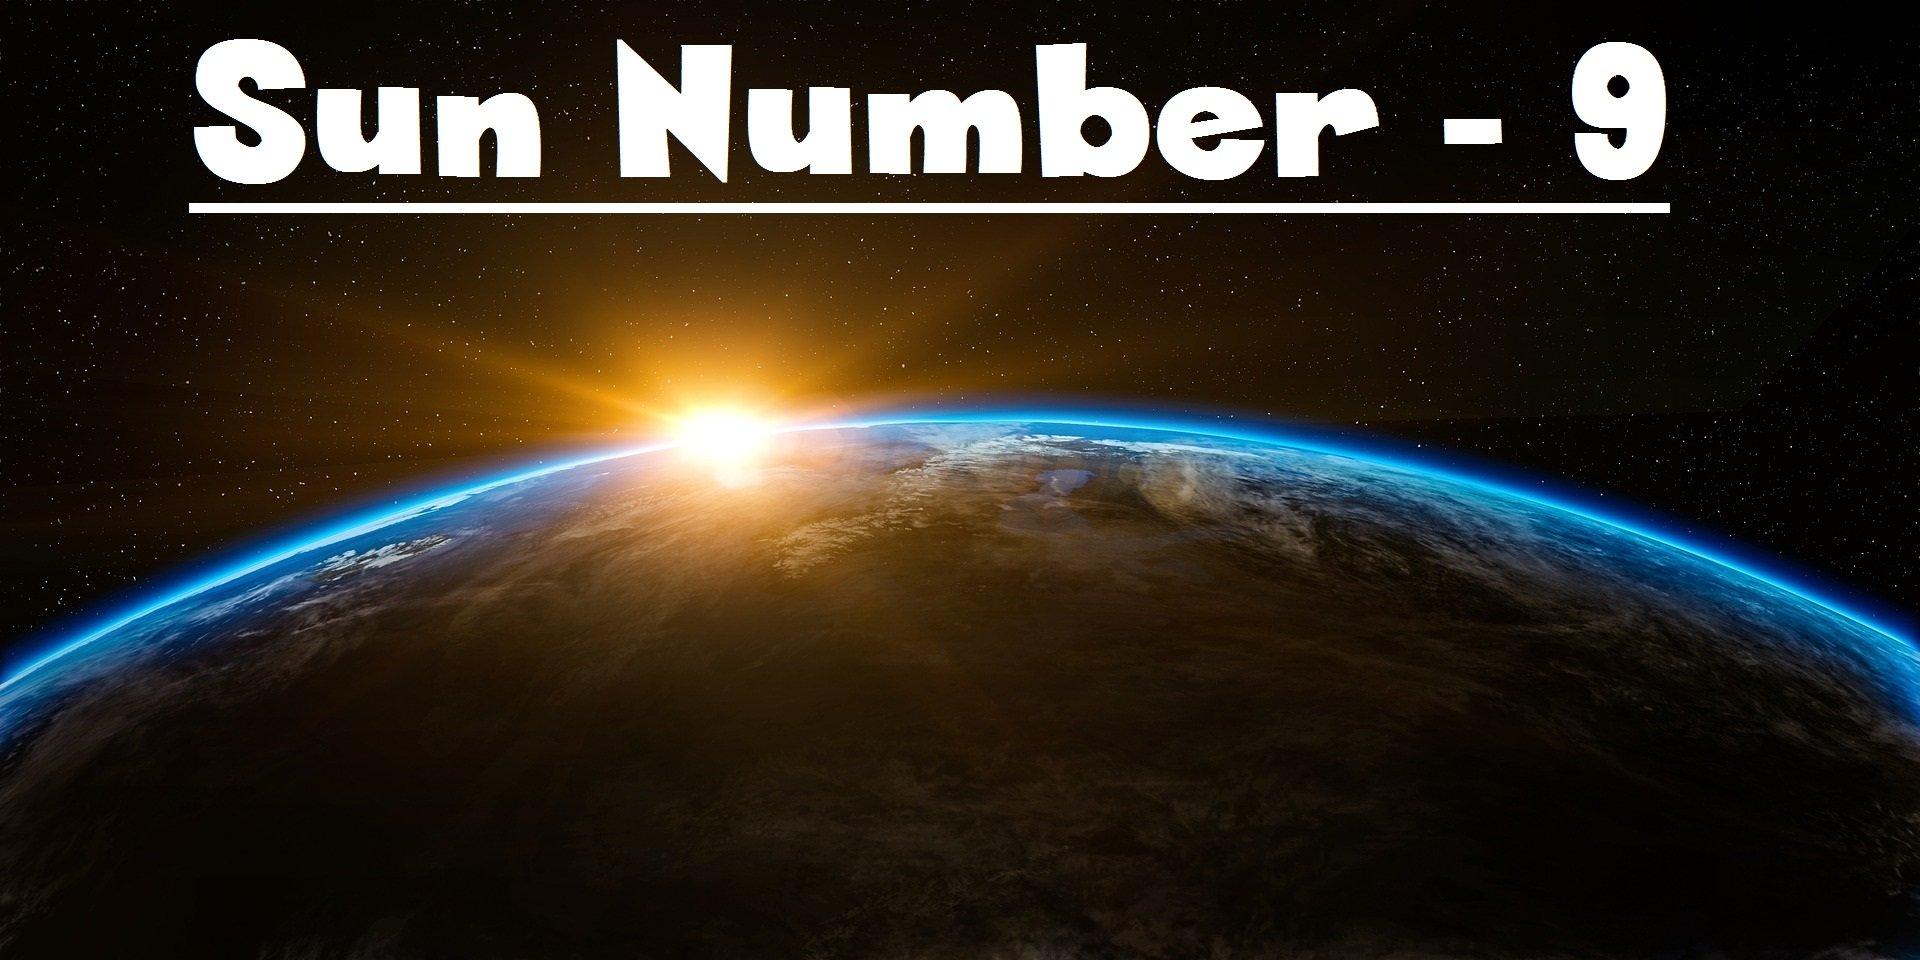 Sun Number 9